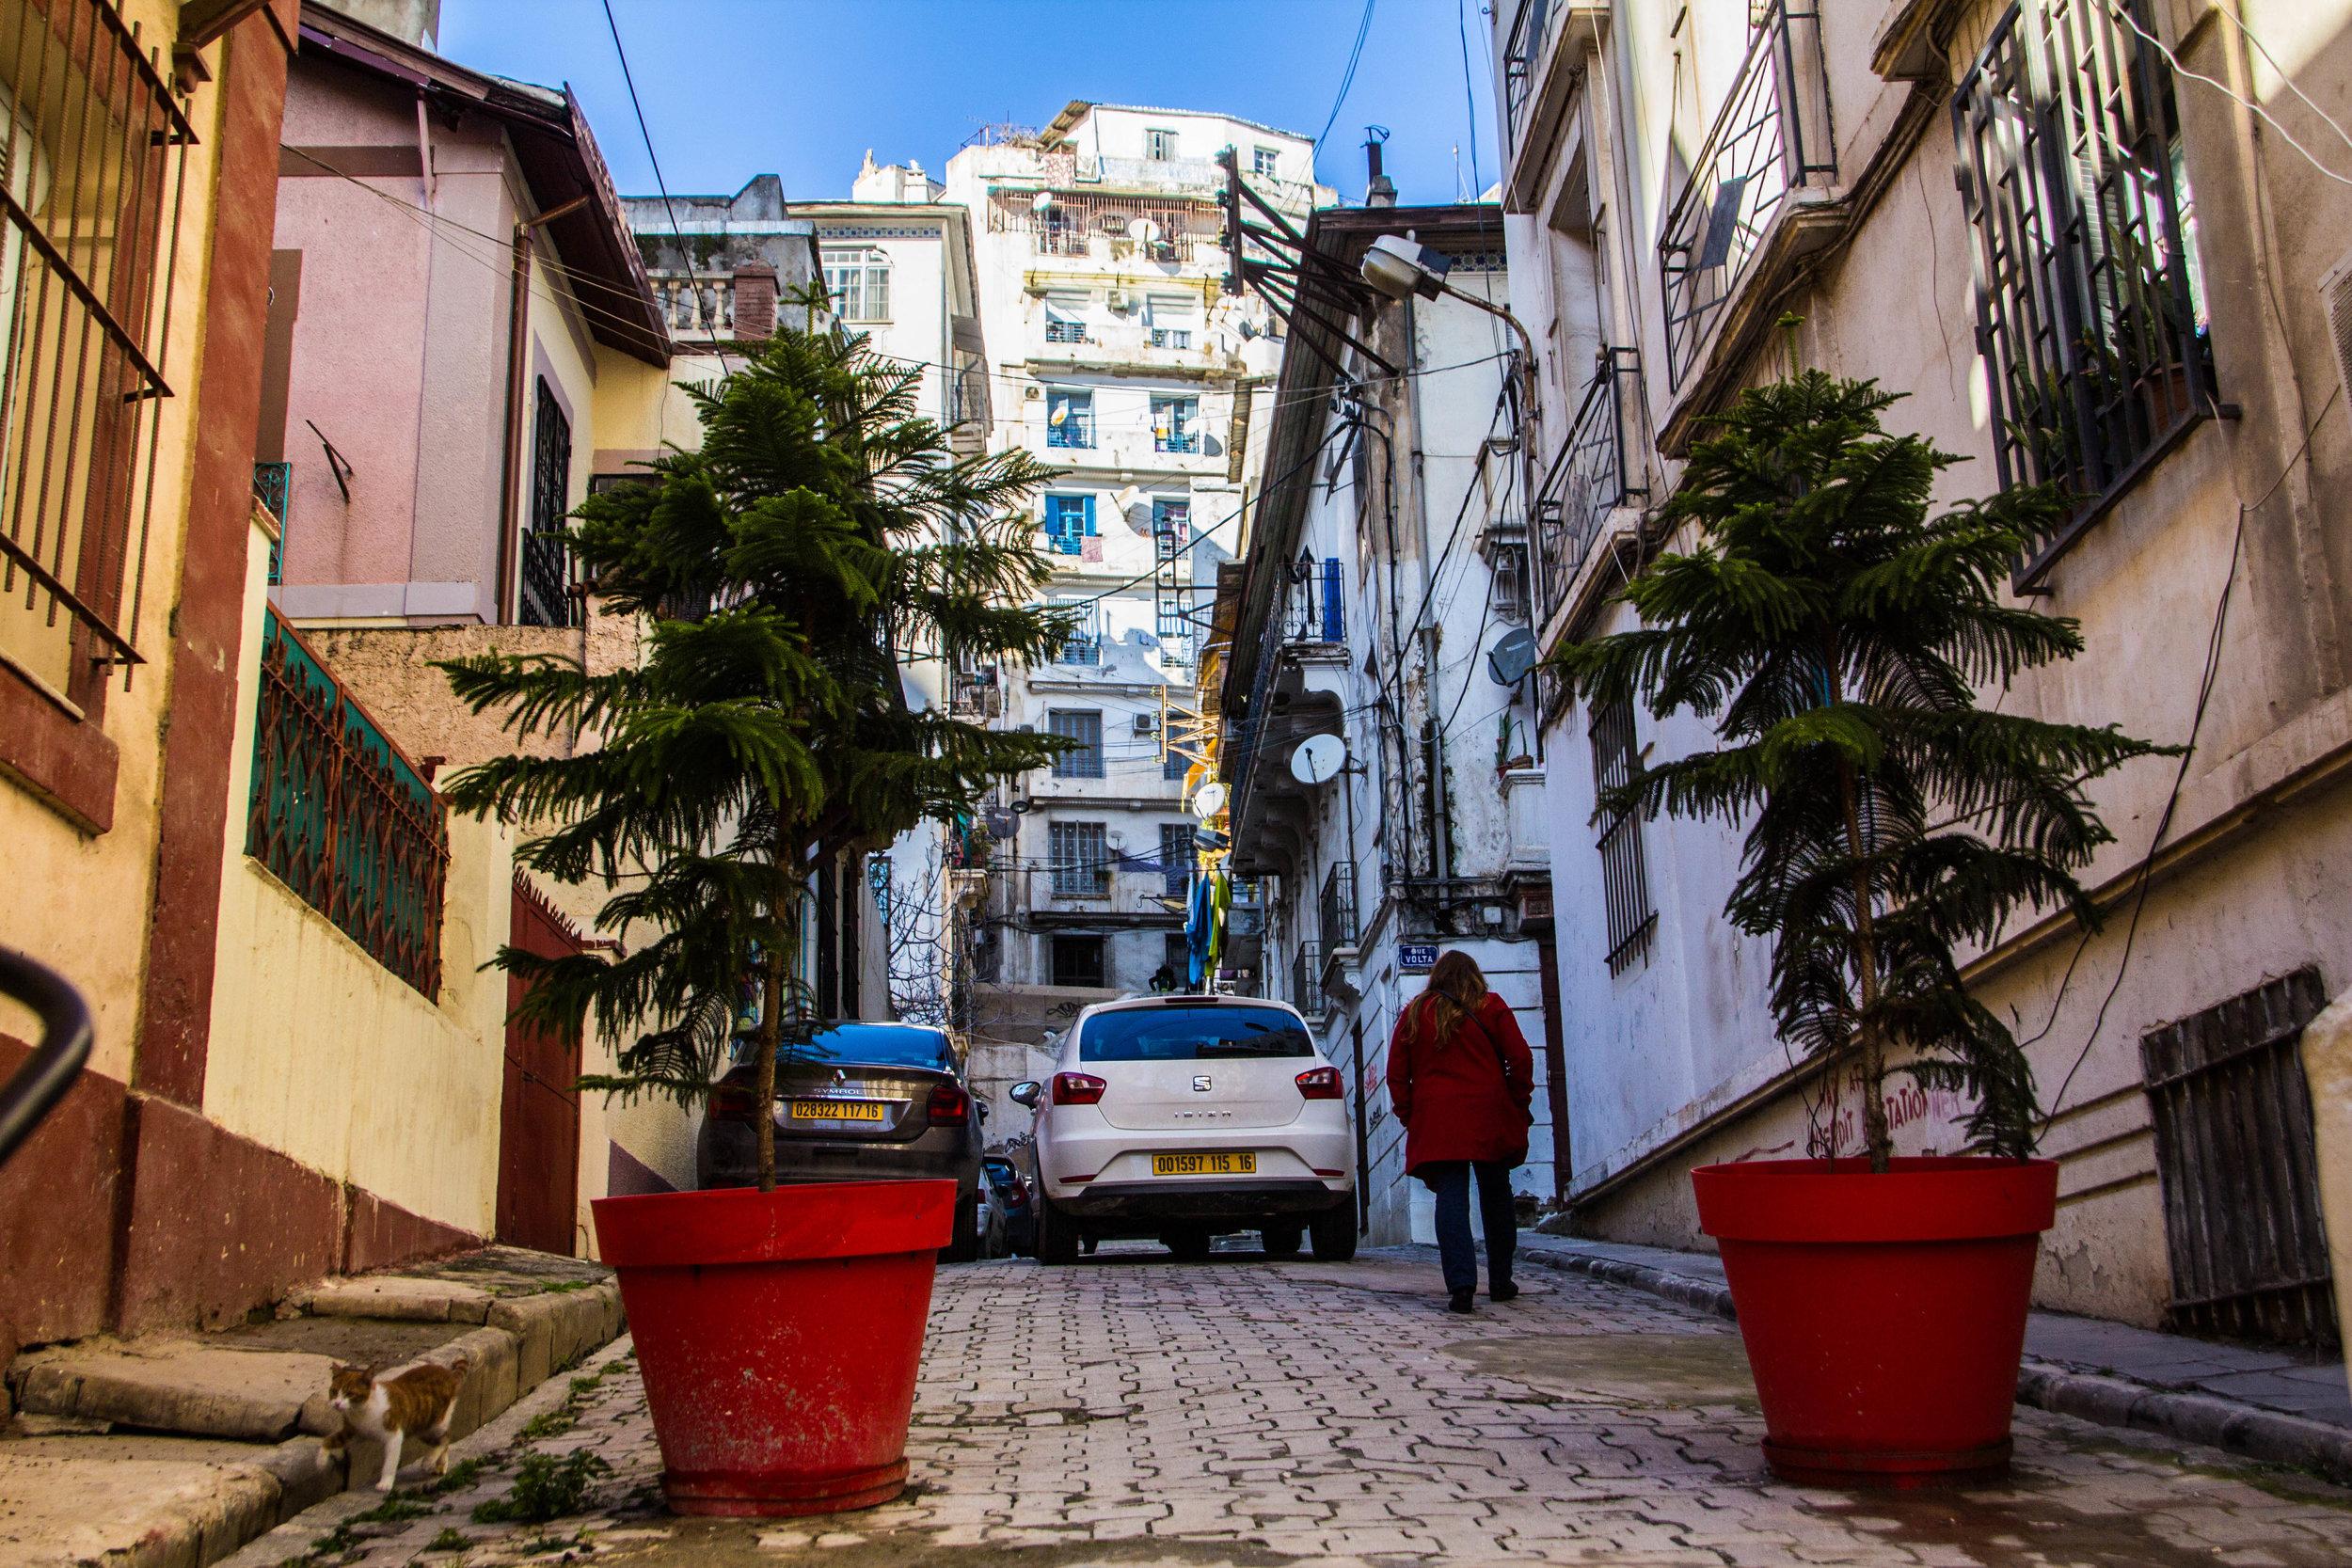 streets-algiers-algeria-19.jpg